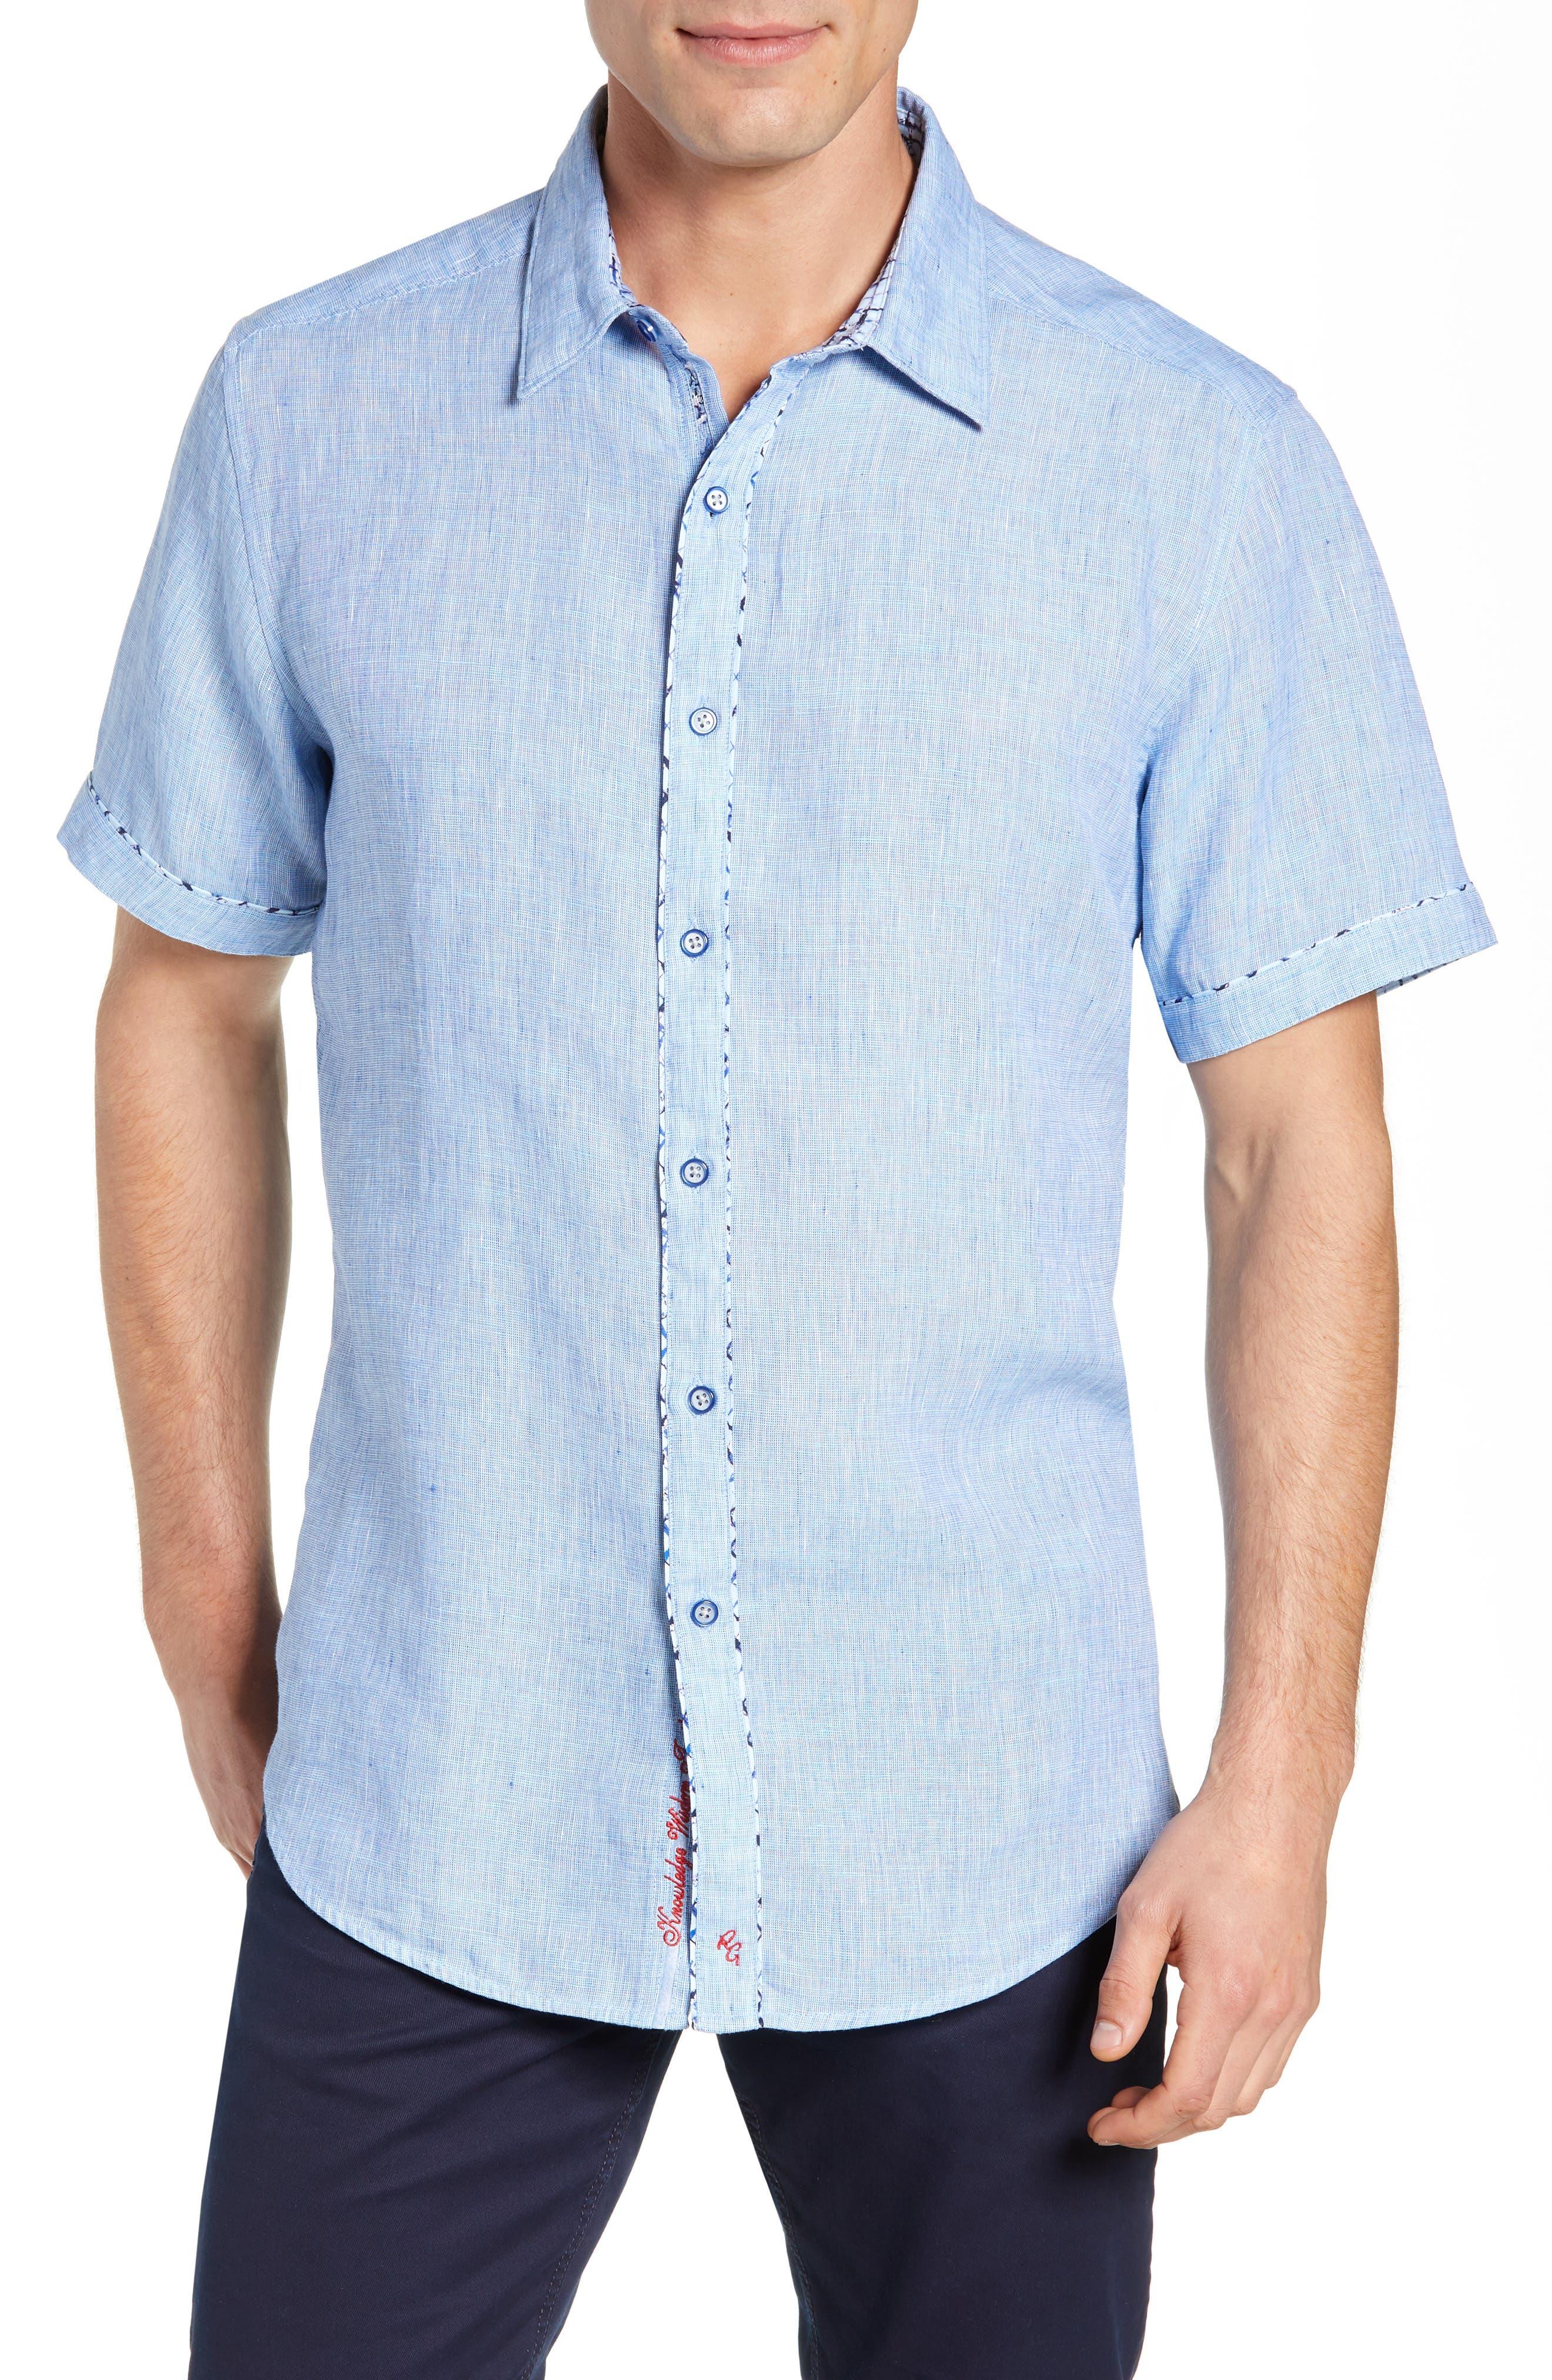 Gills Classic Fit Linen Sport Shirt,                         Main,                         color, LIGHT BLUE